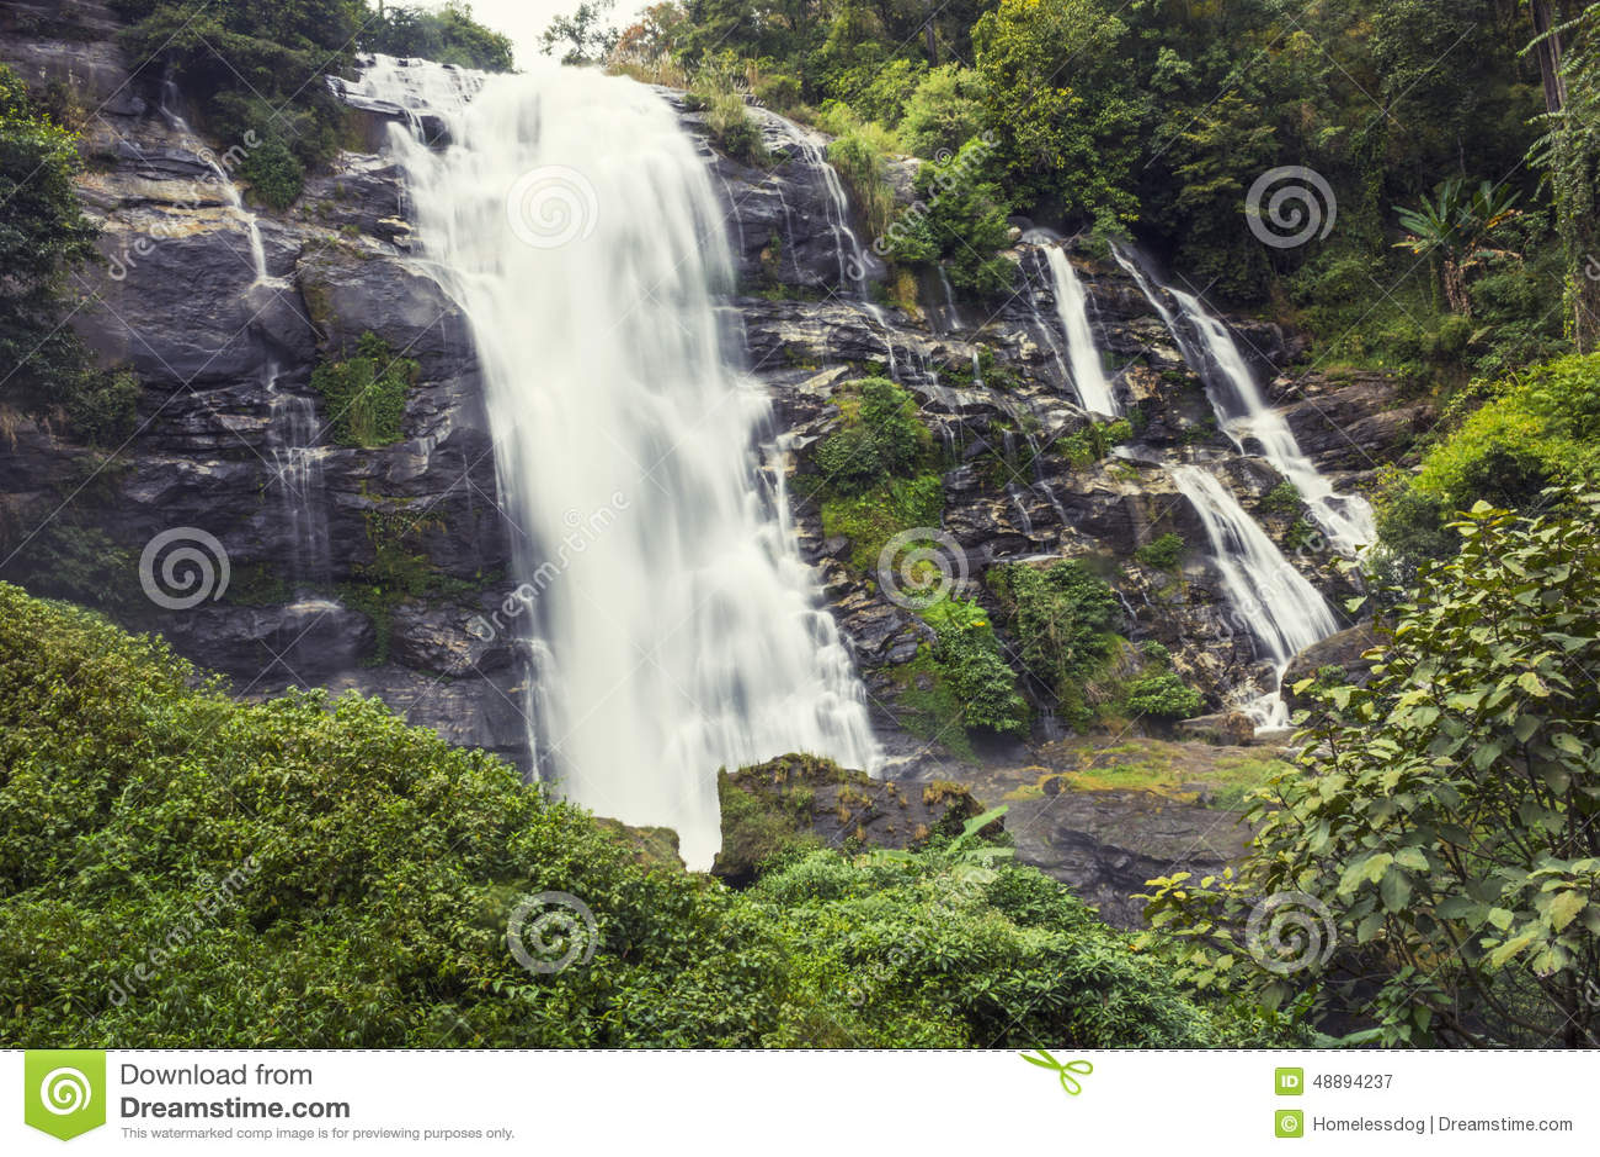 mountains waterfalls forest usa - photo #36